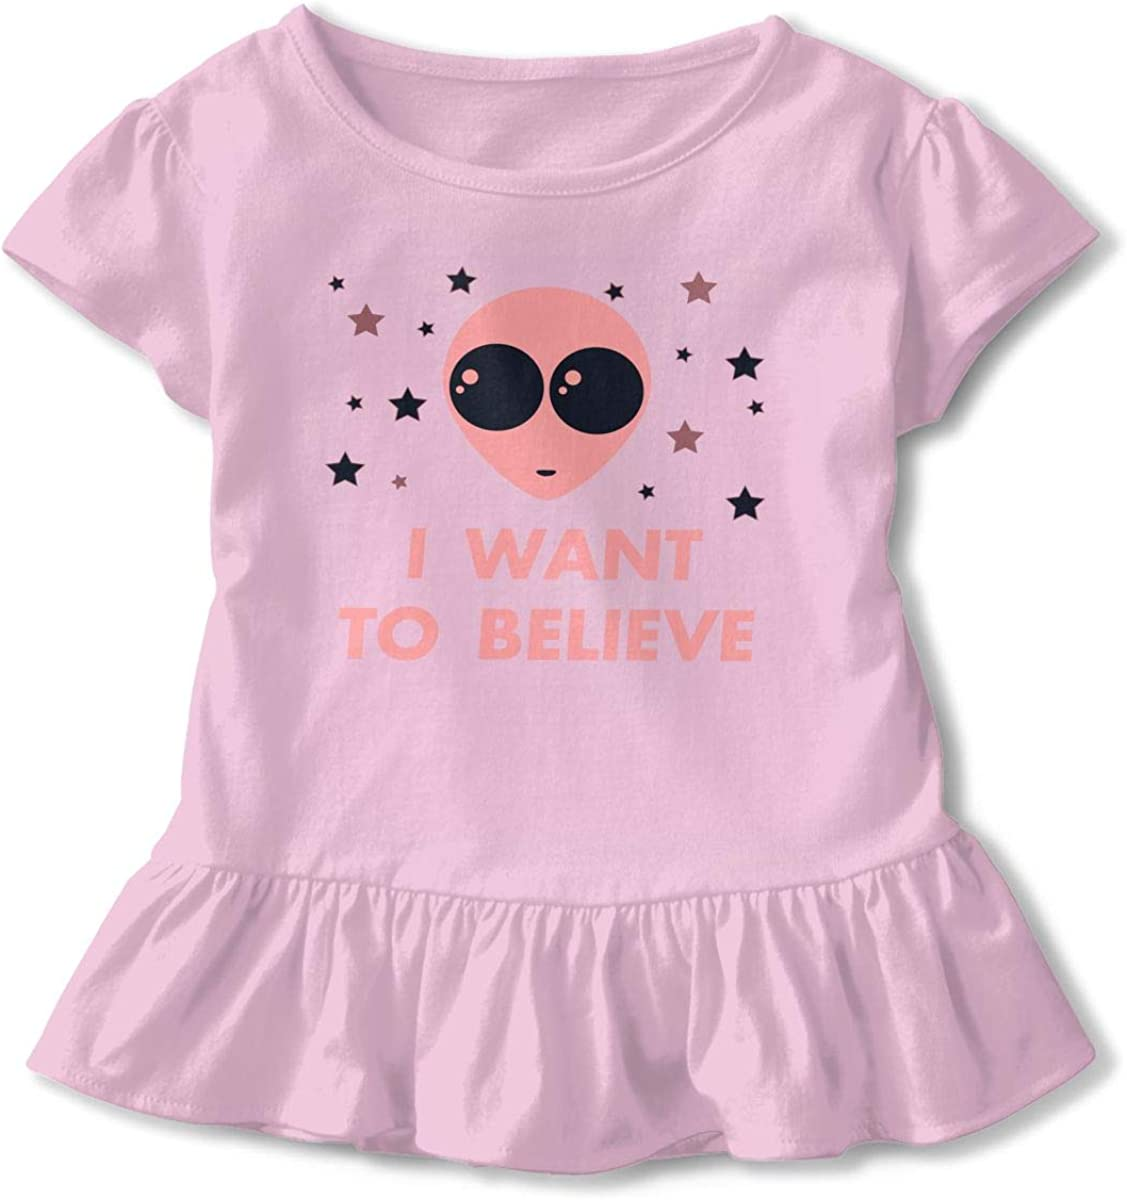 Alien UFO Toddler Girls T Shirt Kids Cotton Short Sleeve Ruffle Tee